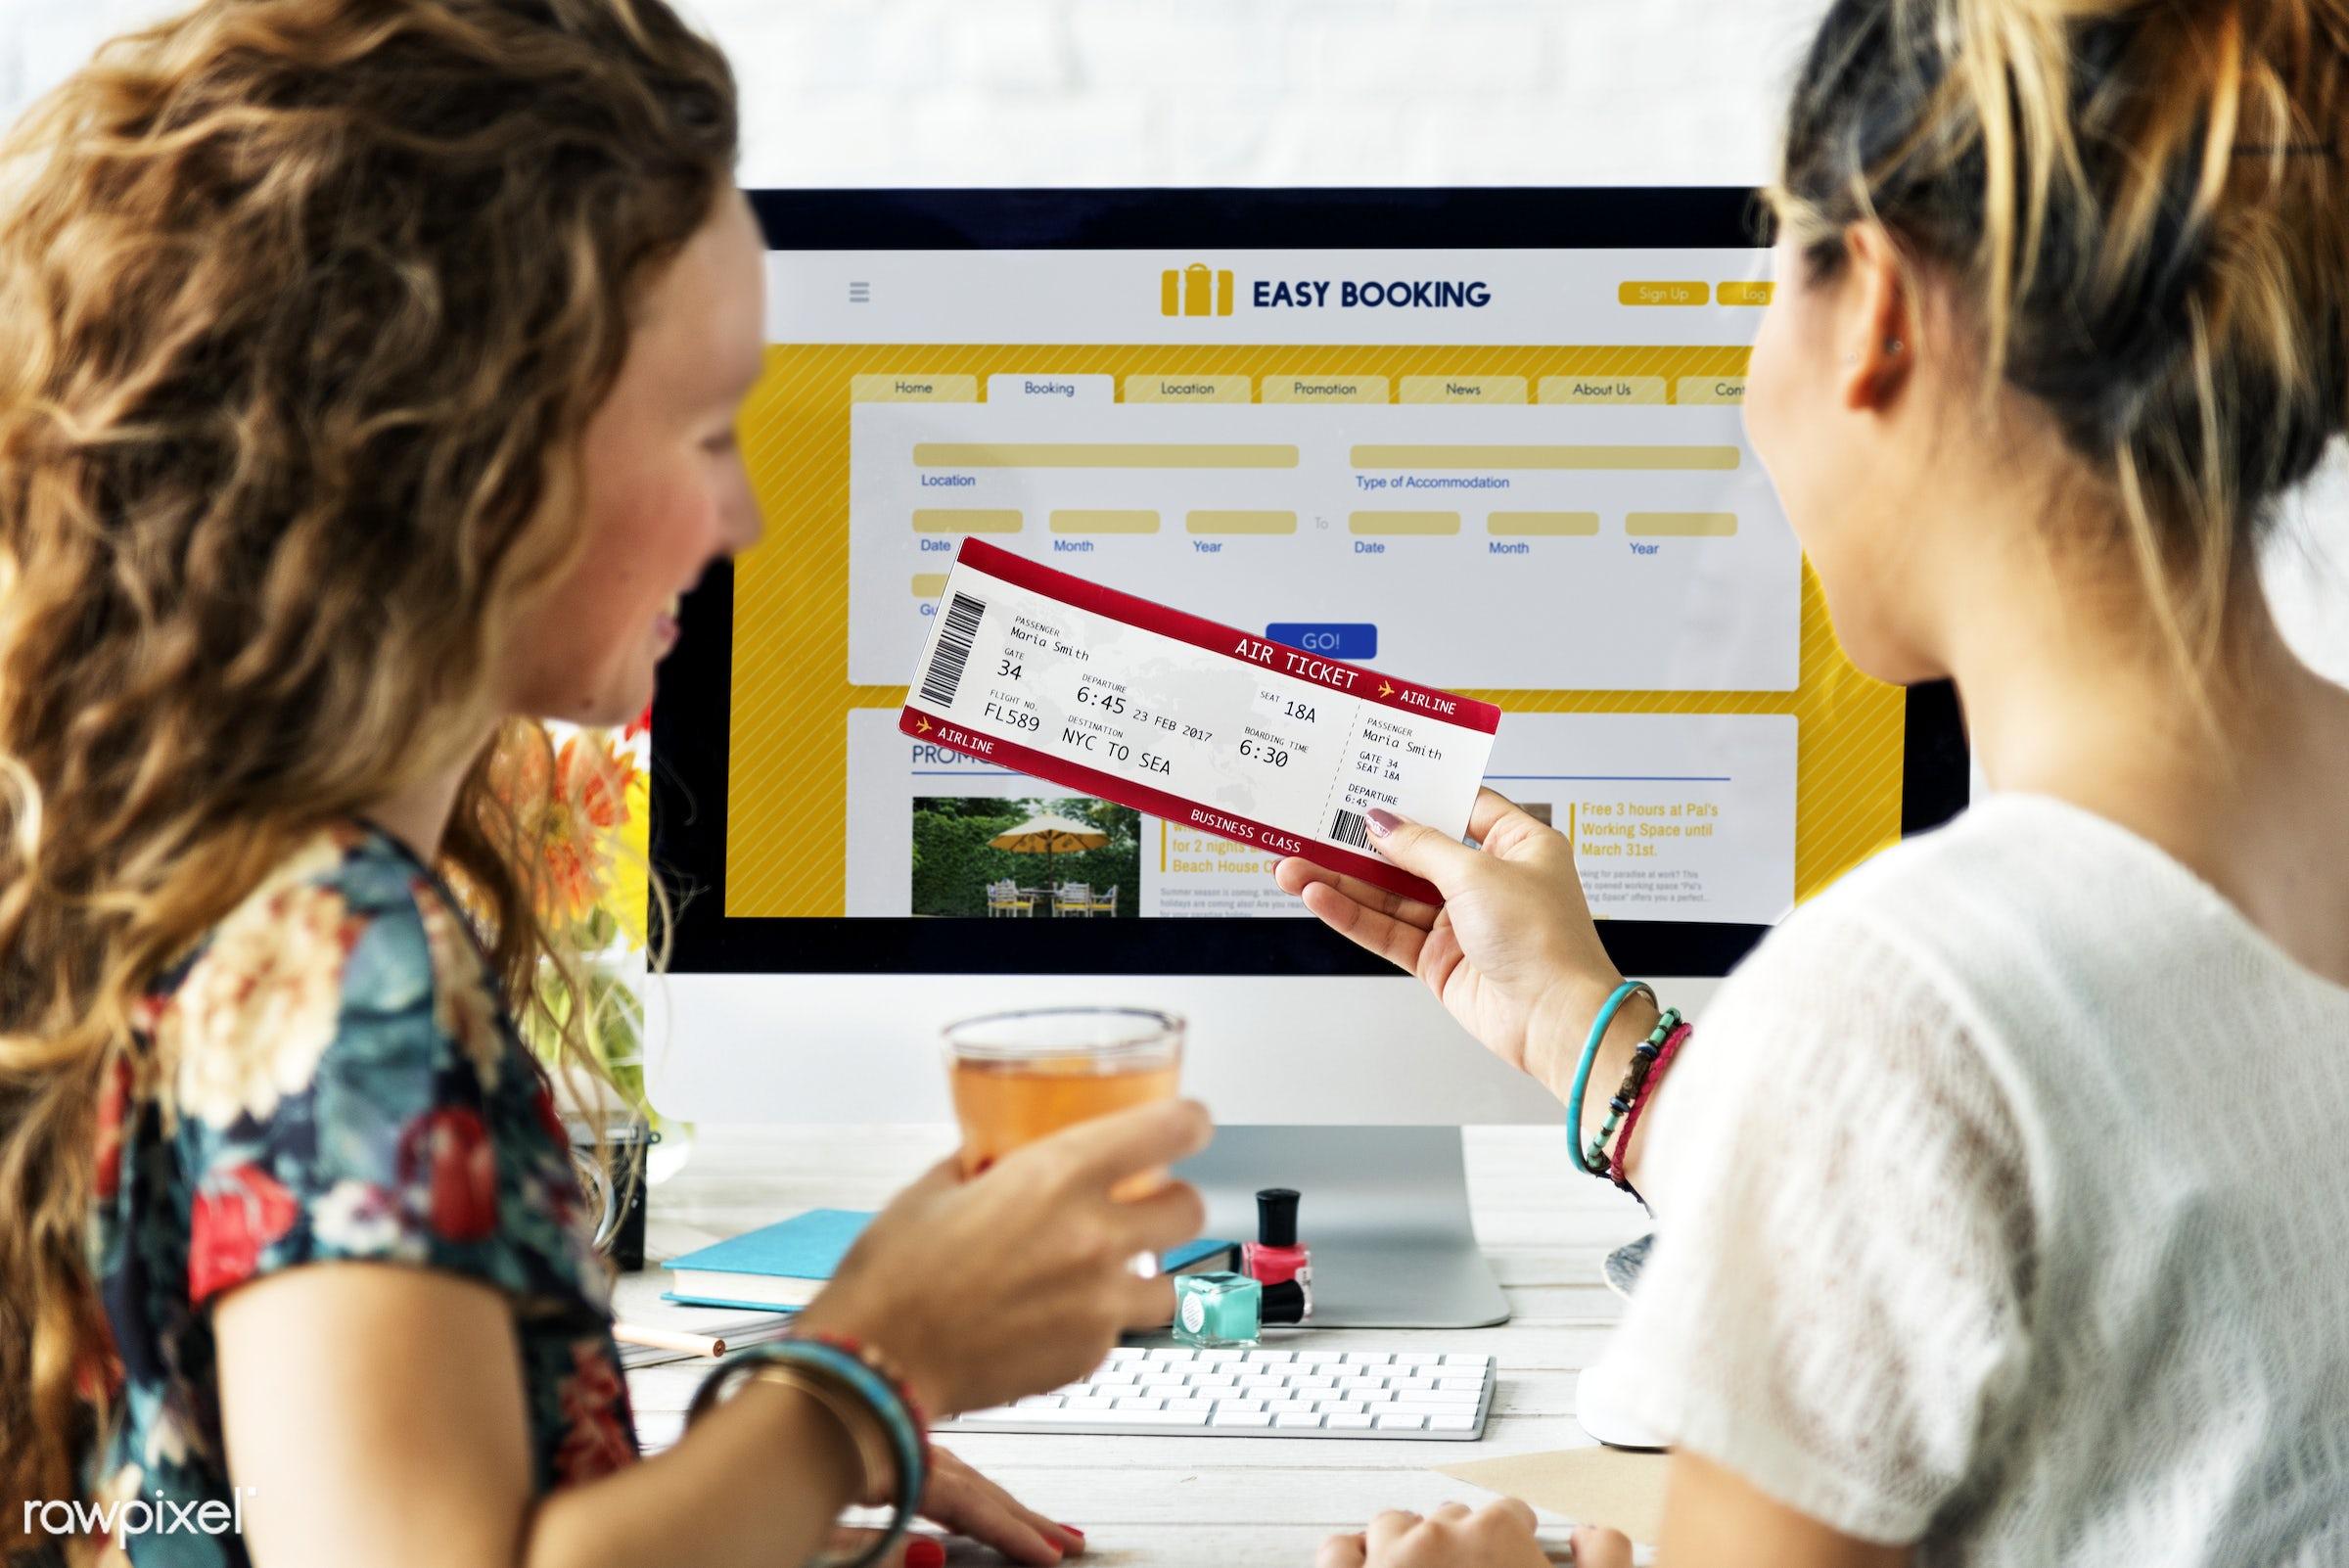 booking, computer, destination, device, digital, flight, fly, form, friends, friendship, holiday, hotel, internet, journey,...